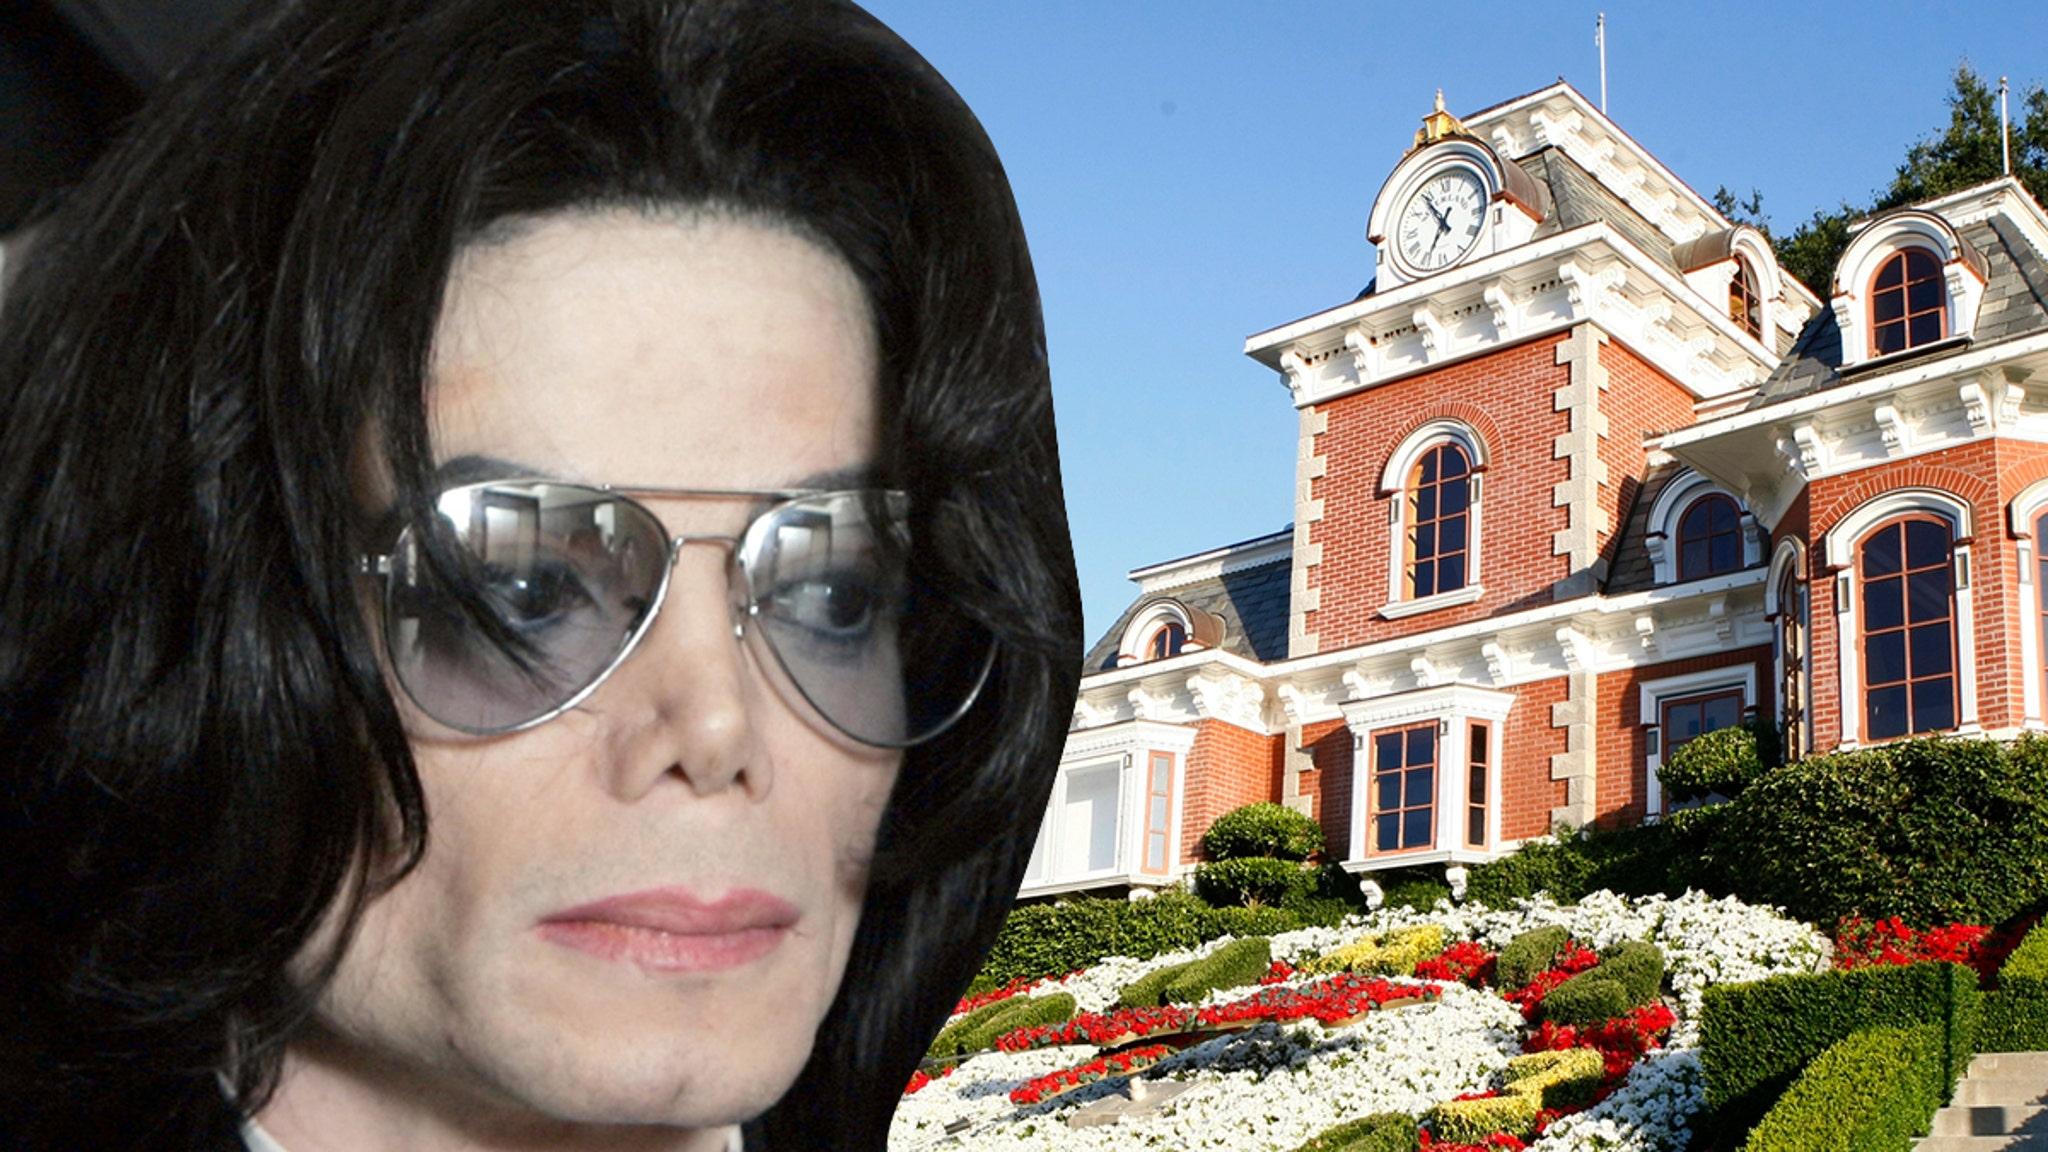 Alleged Trespasser Shoots Music Vid at Michael Jackson's Neverland Ranch